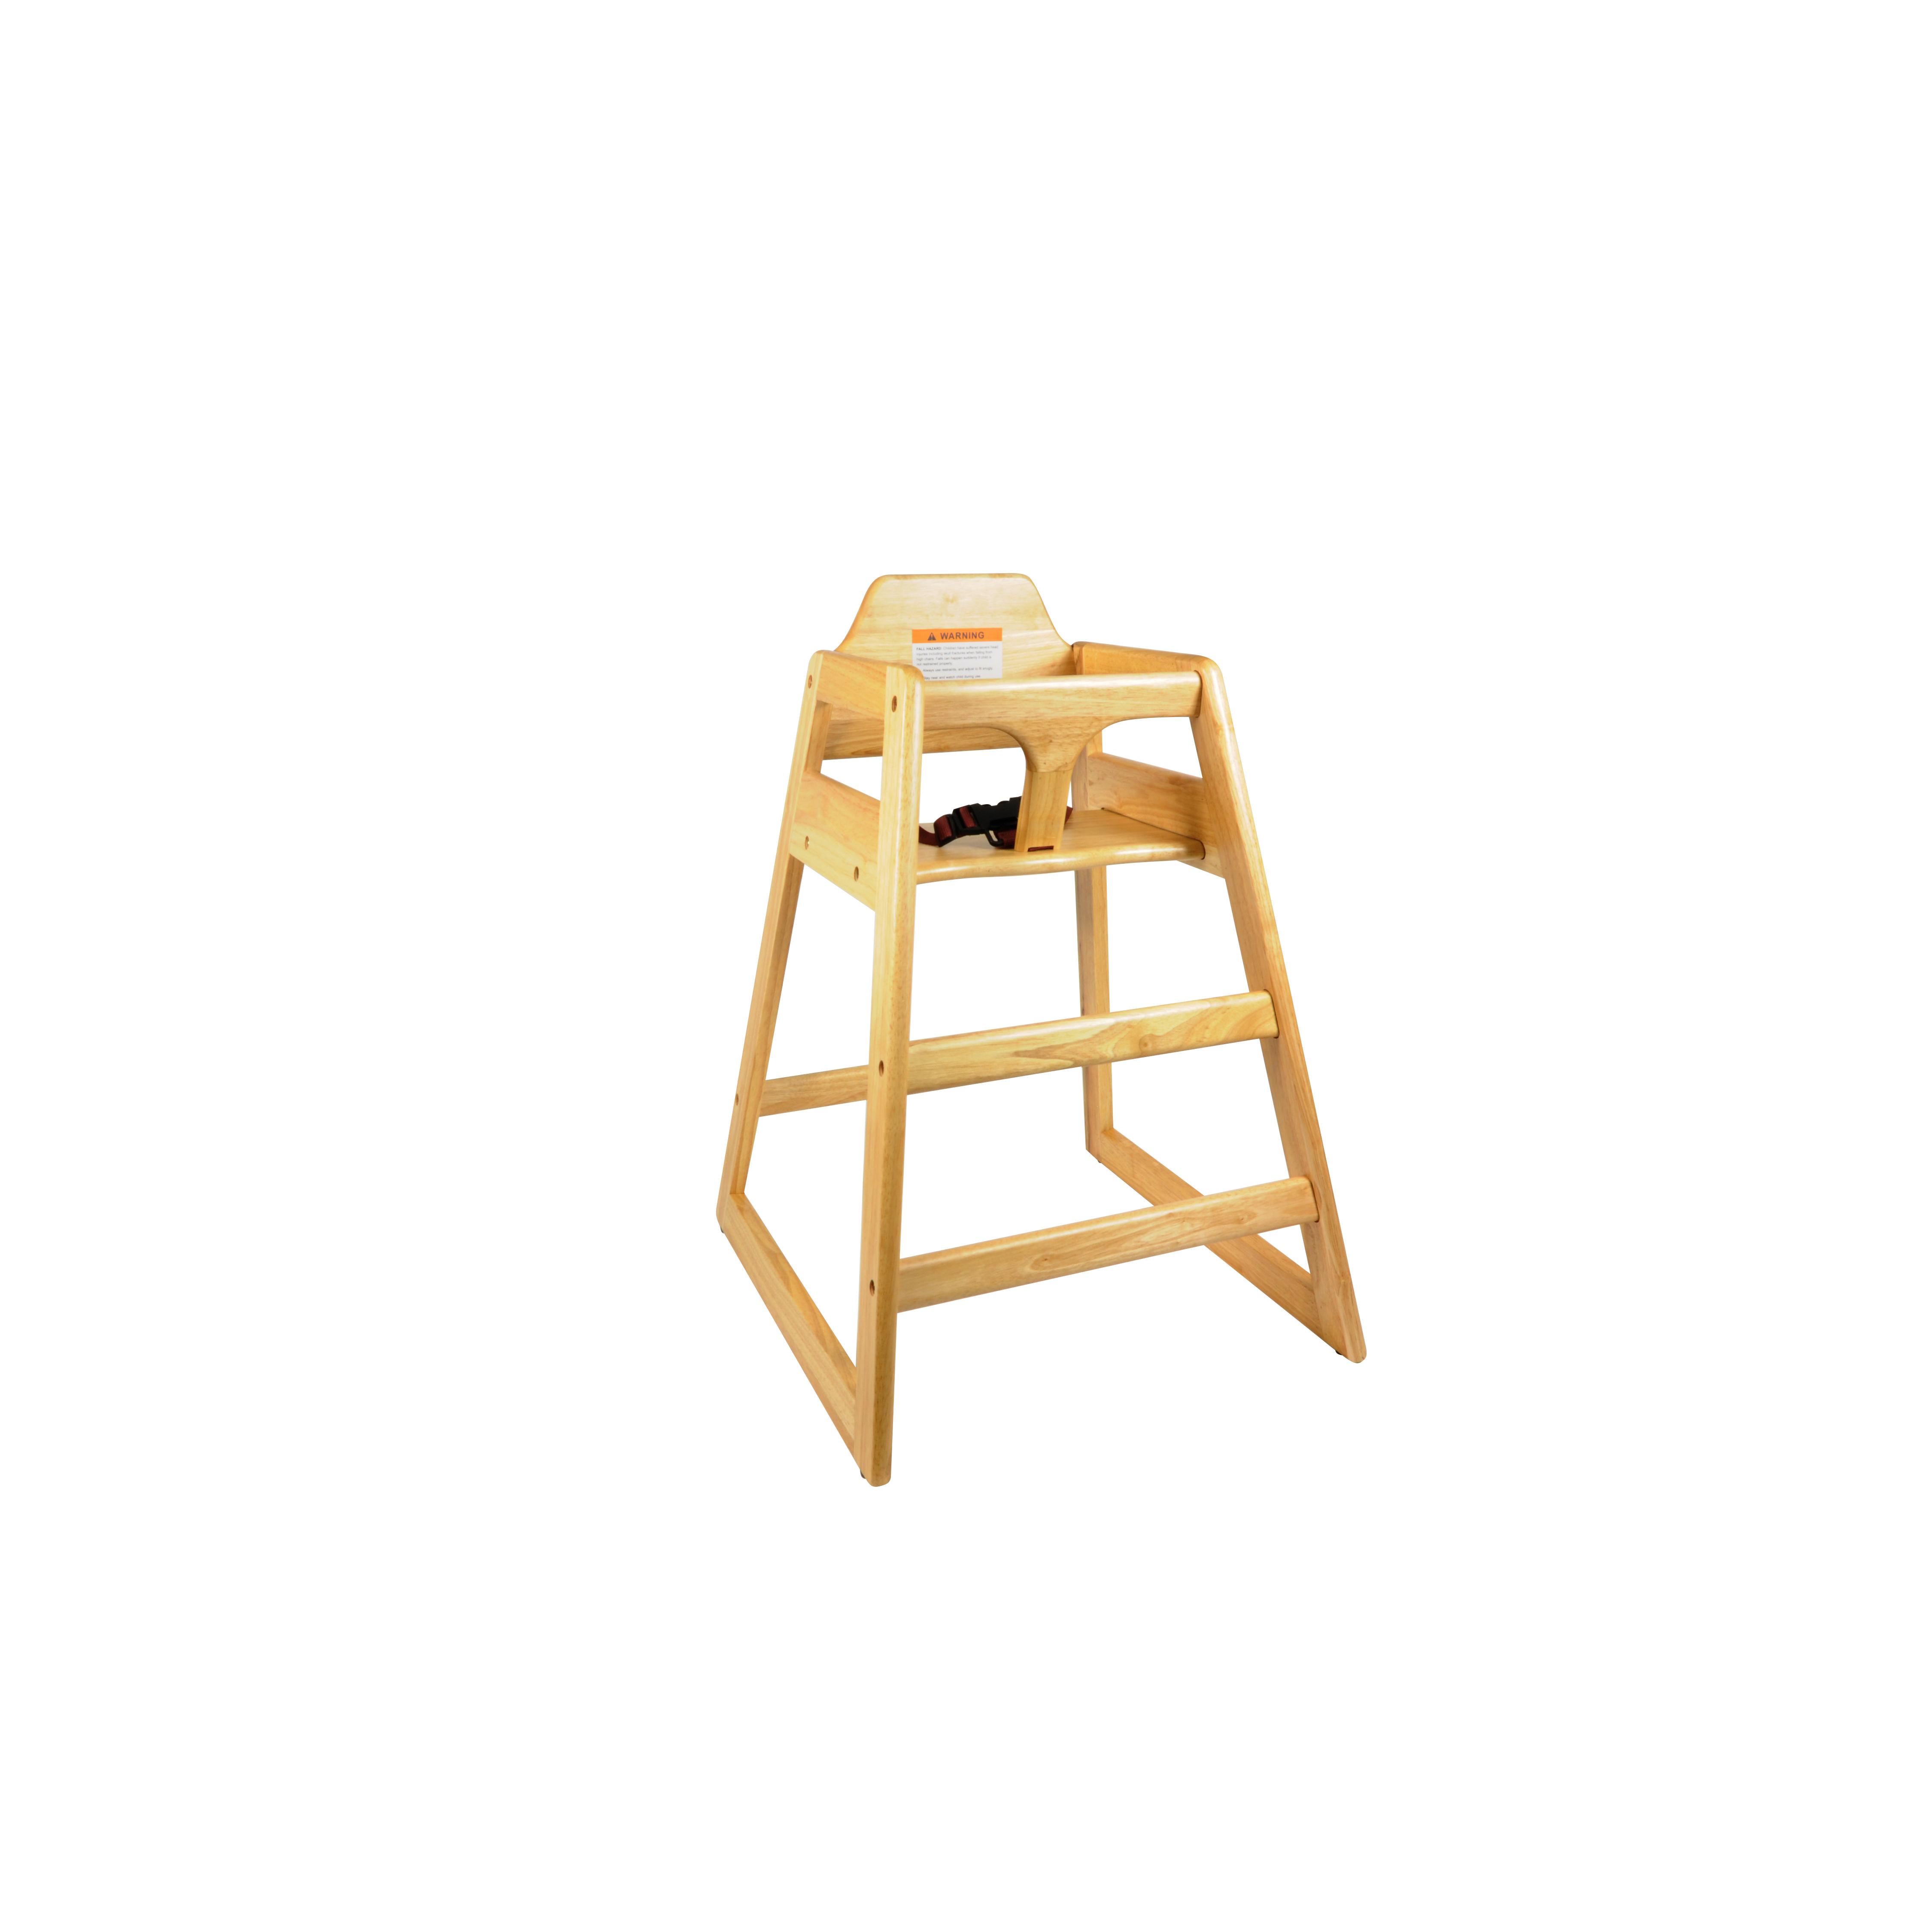 Thunder Group WDTHHC018A high chair, wood